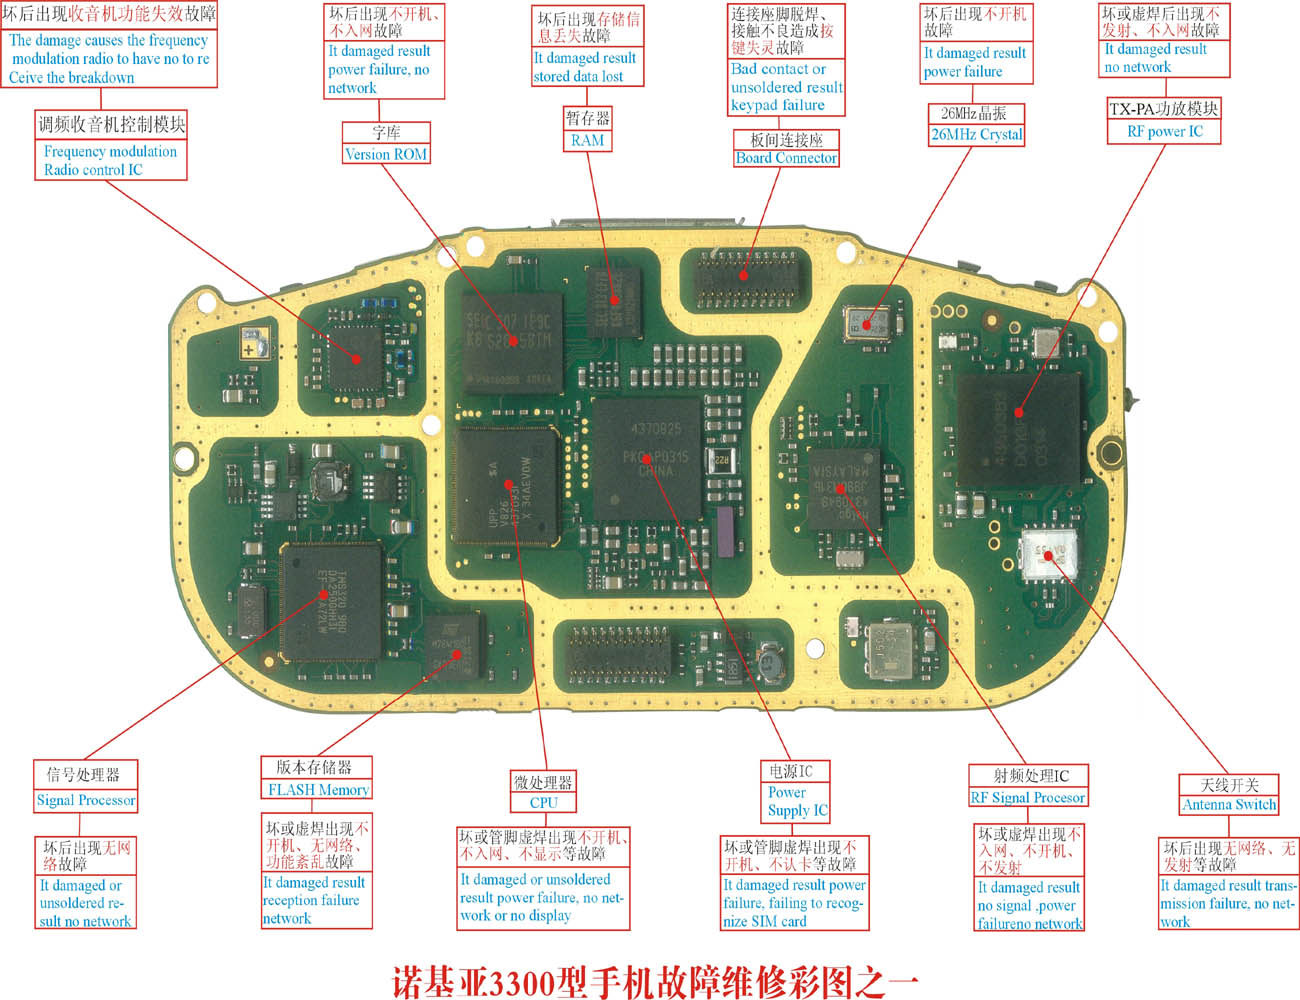 Nokia 3300 Mobile Fault Repairing Physical Color Picture 1 Sim Card Circuit Diagram